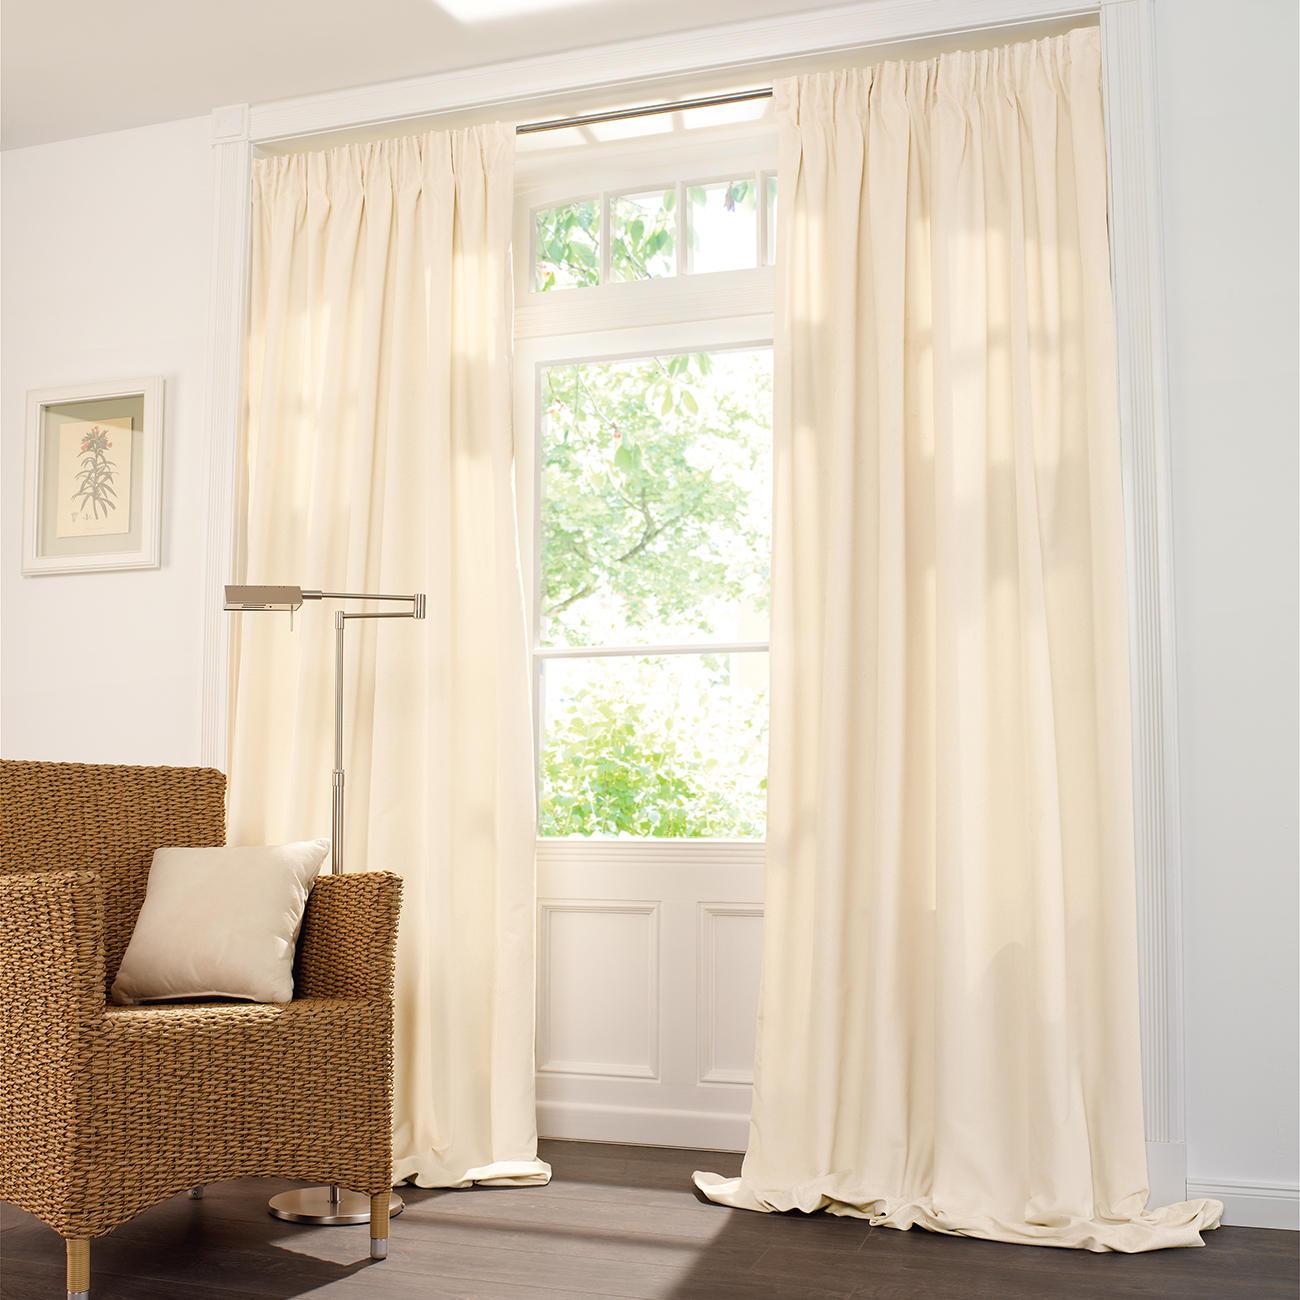 vorhang thermi 1 st ck vorh nge kaufen das kavaliershaus. Black Bedroom Furniture Sets. Home Design Ideas